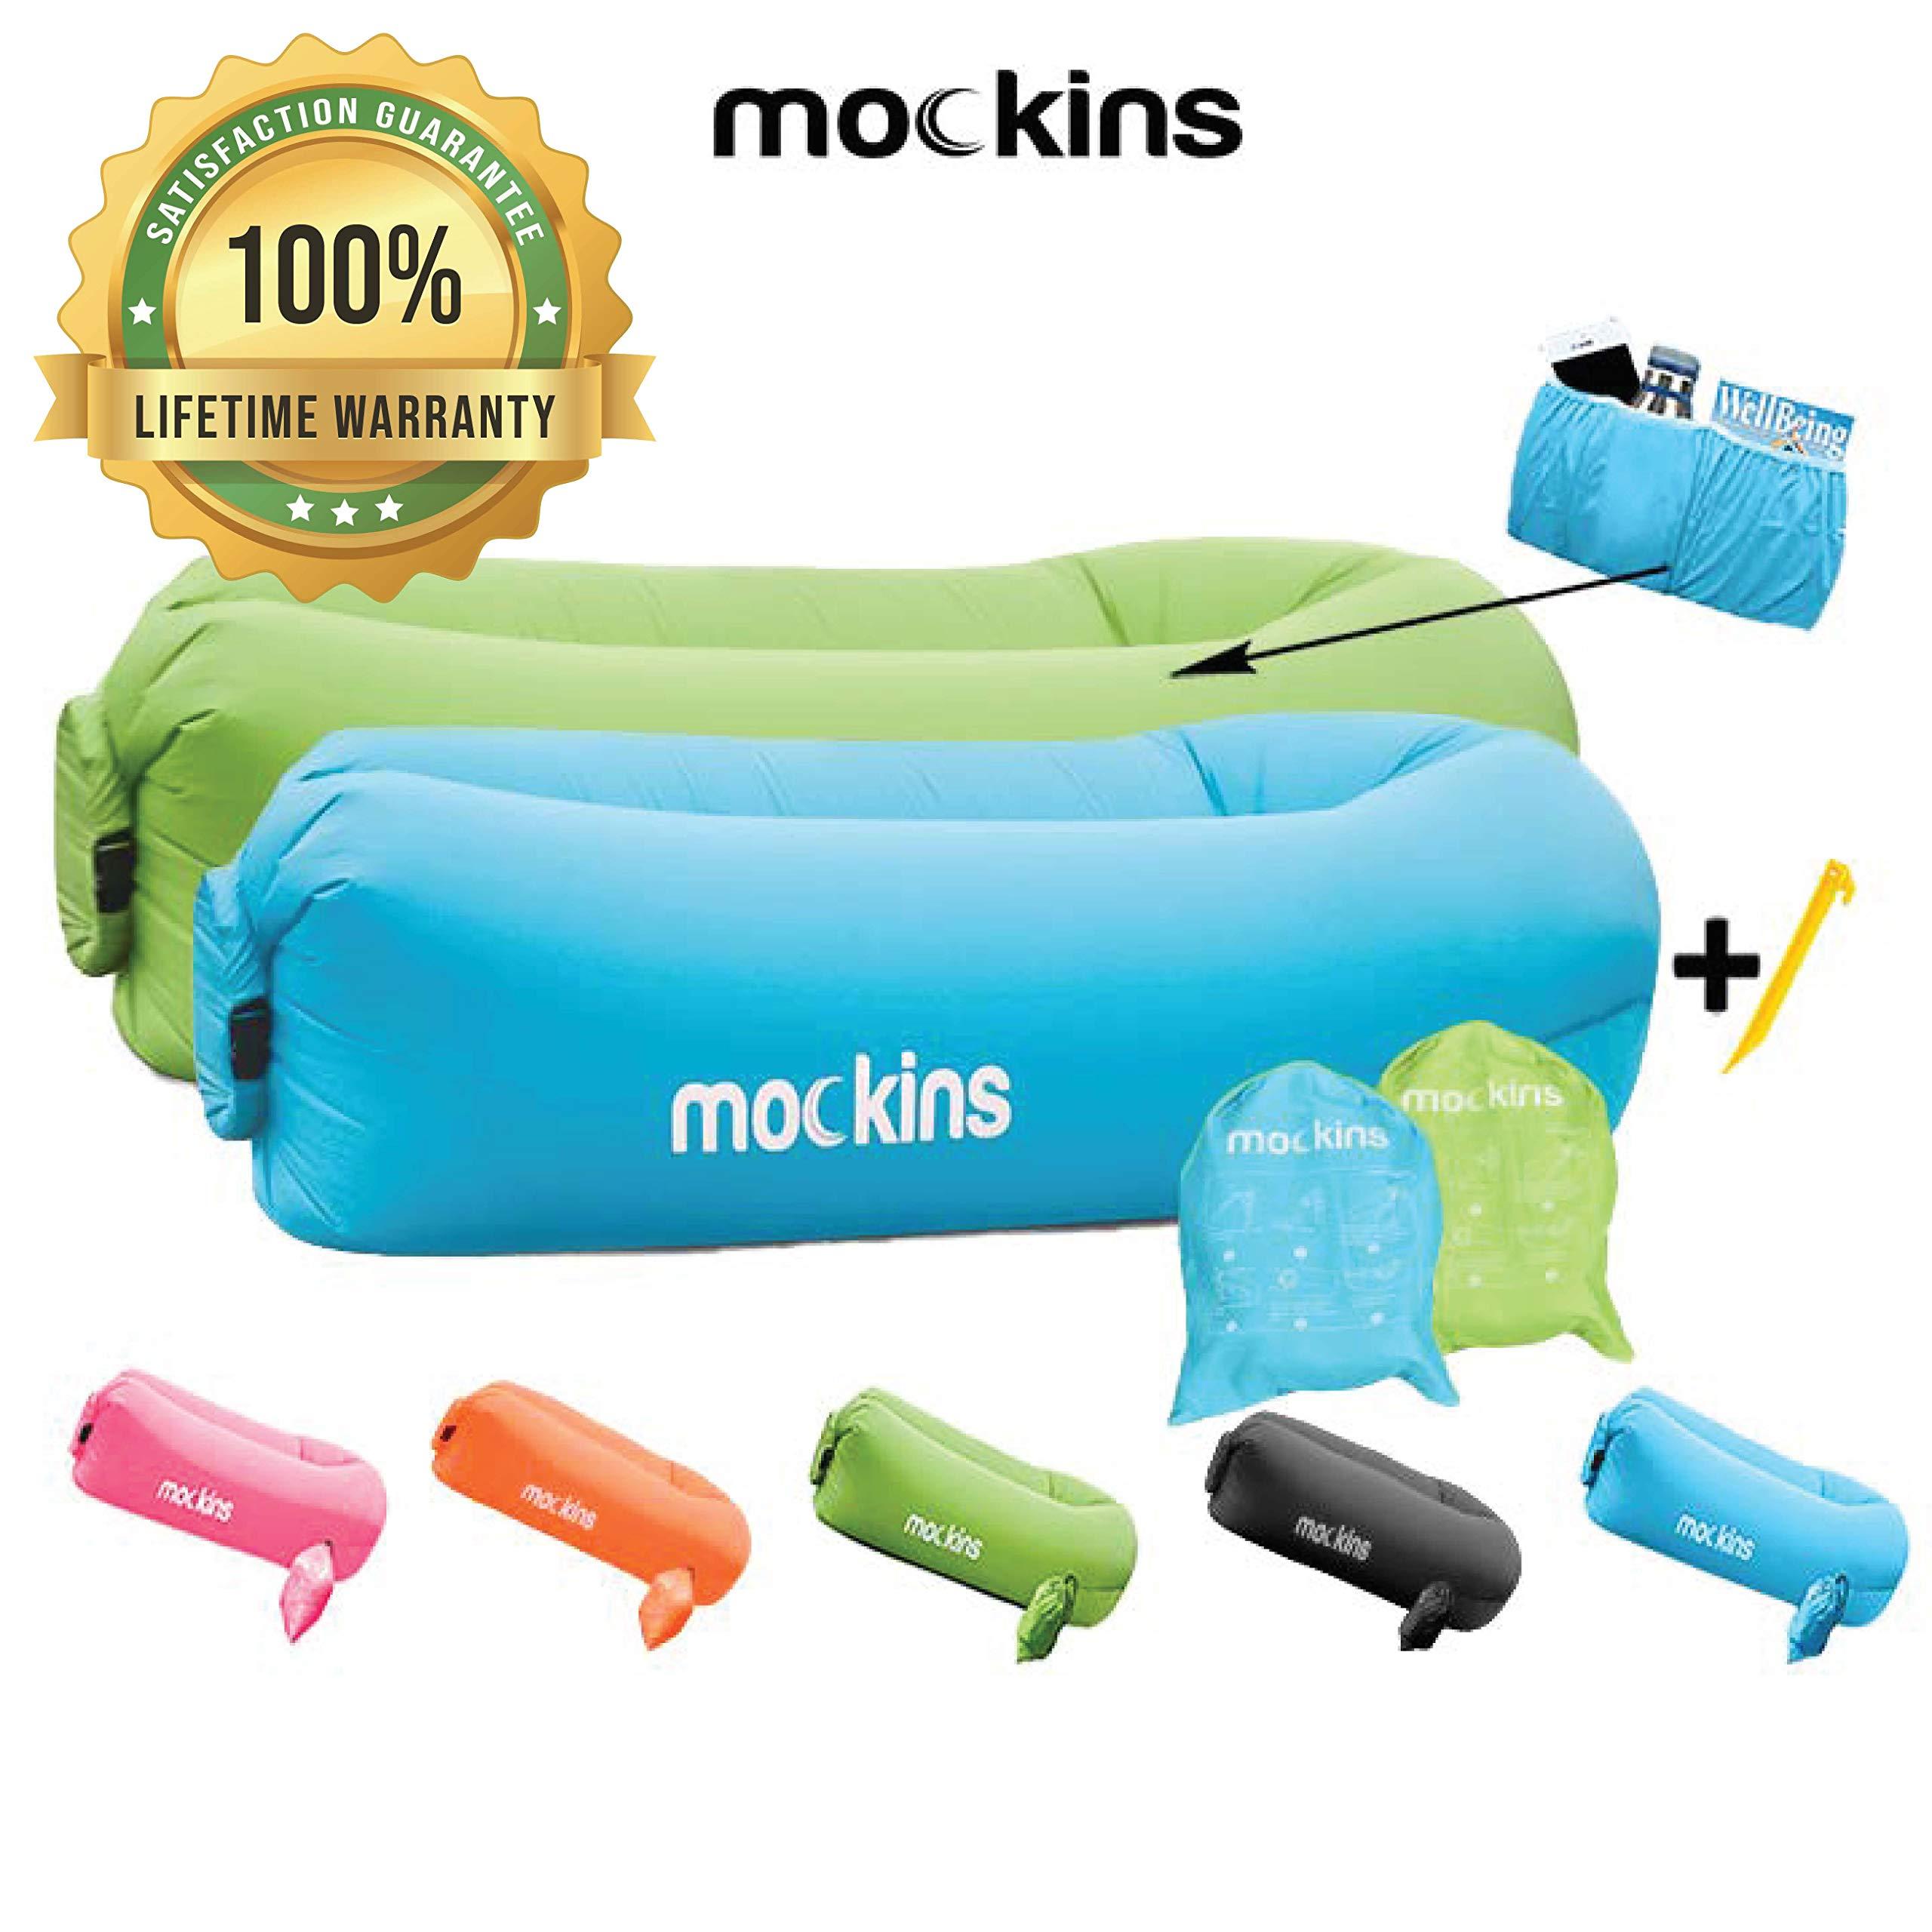 Mockins Inflatable Portable Festivals Accessories